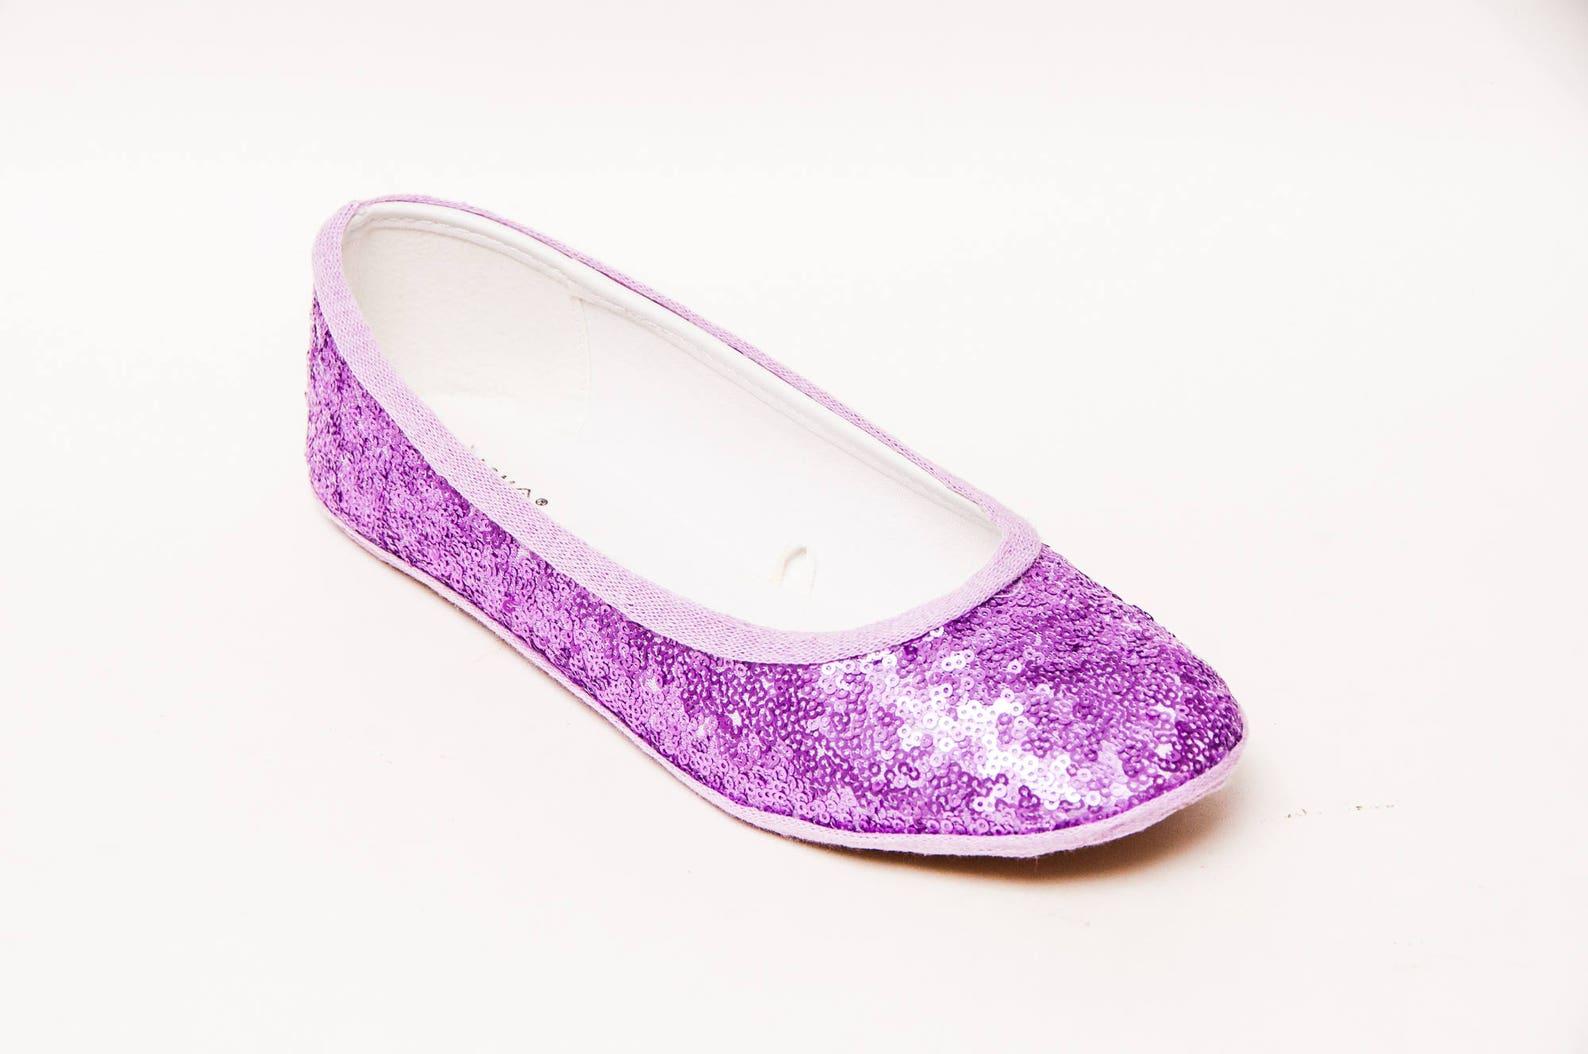 sequin - lilac purple slipper ballet flats custom shoes